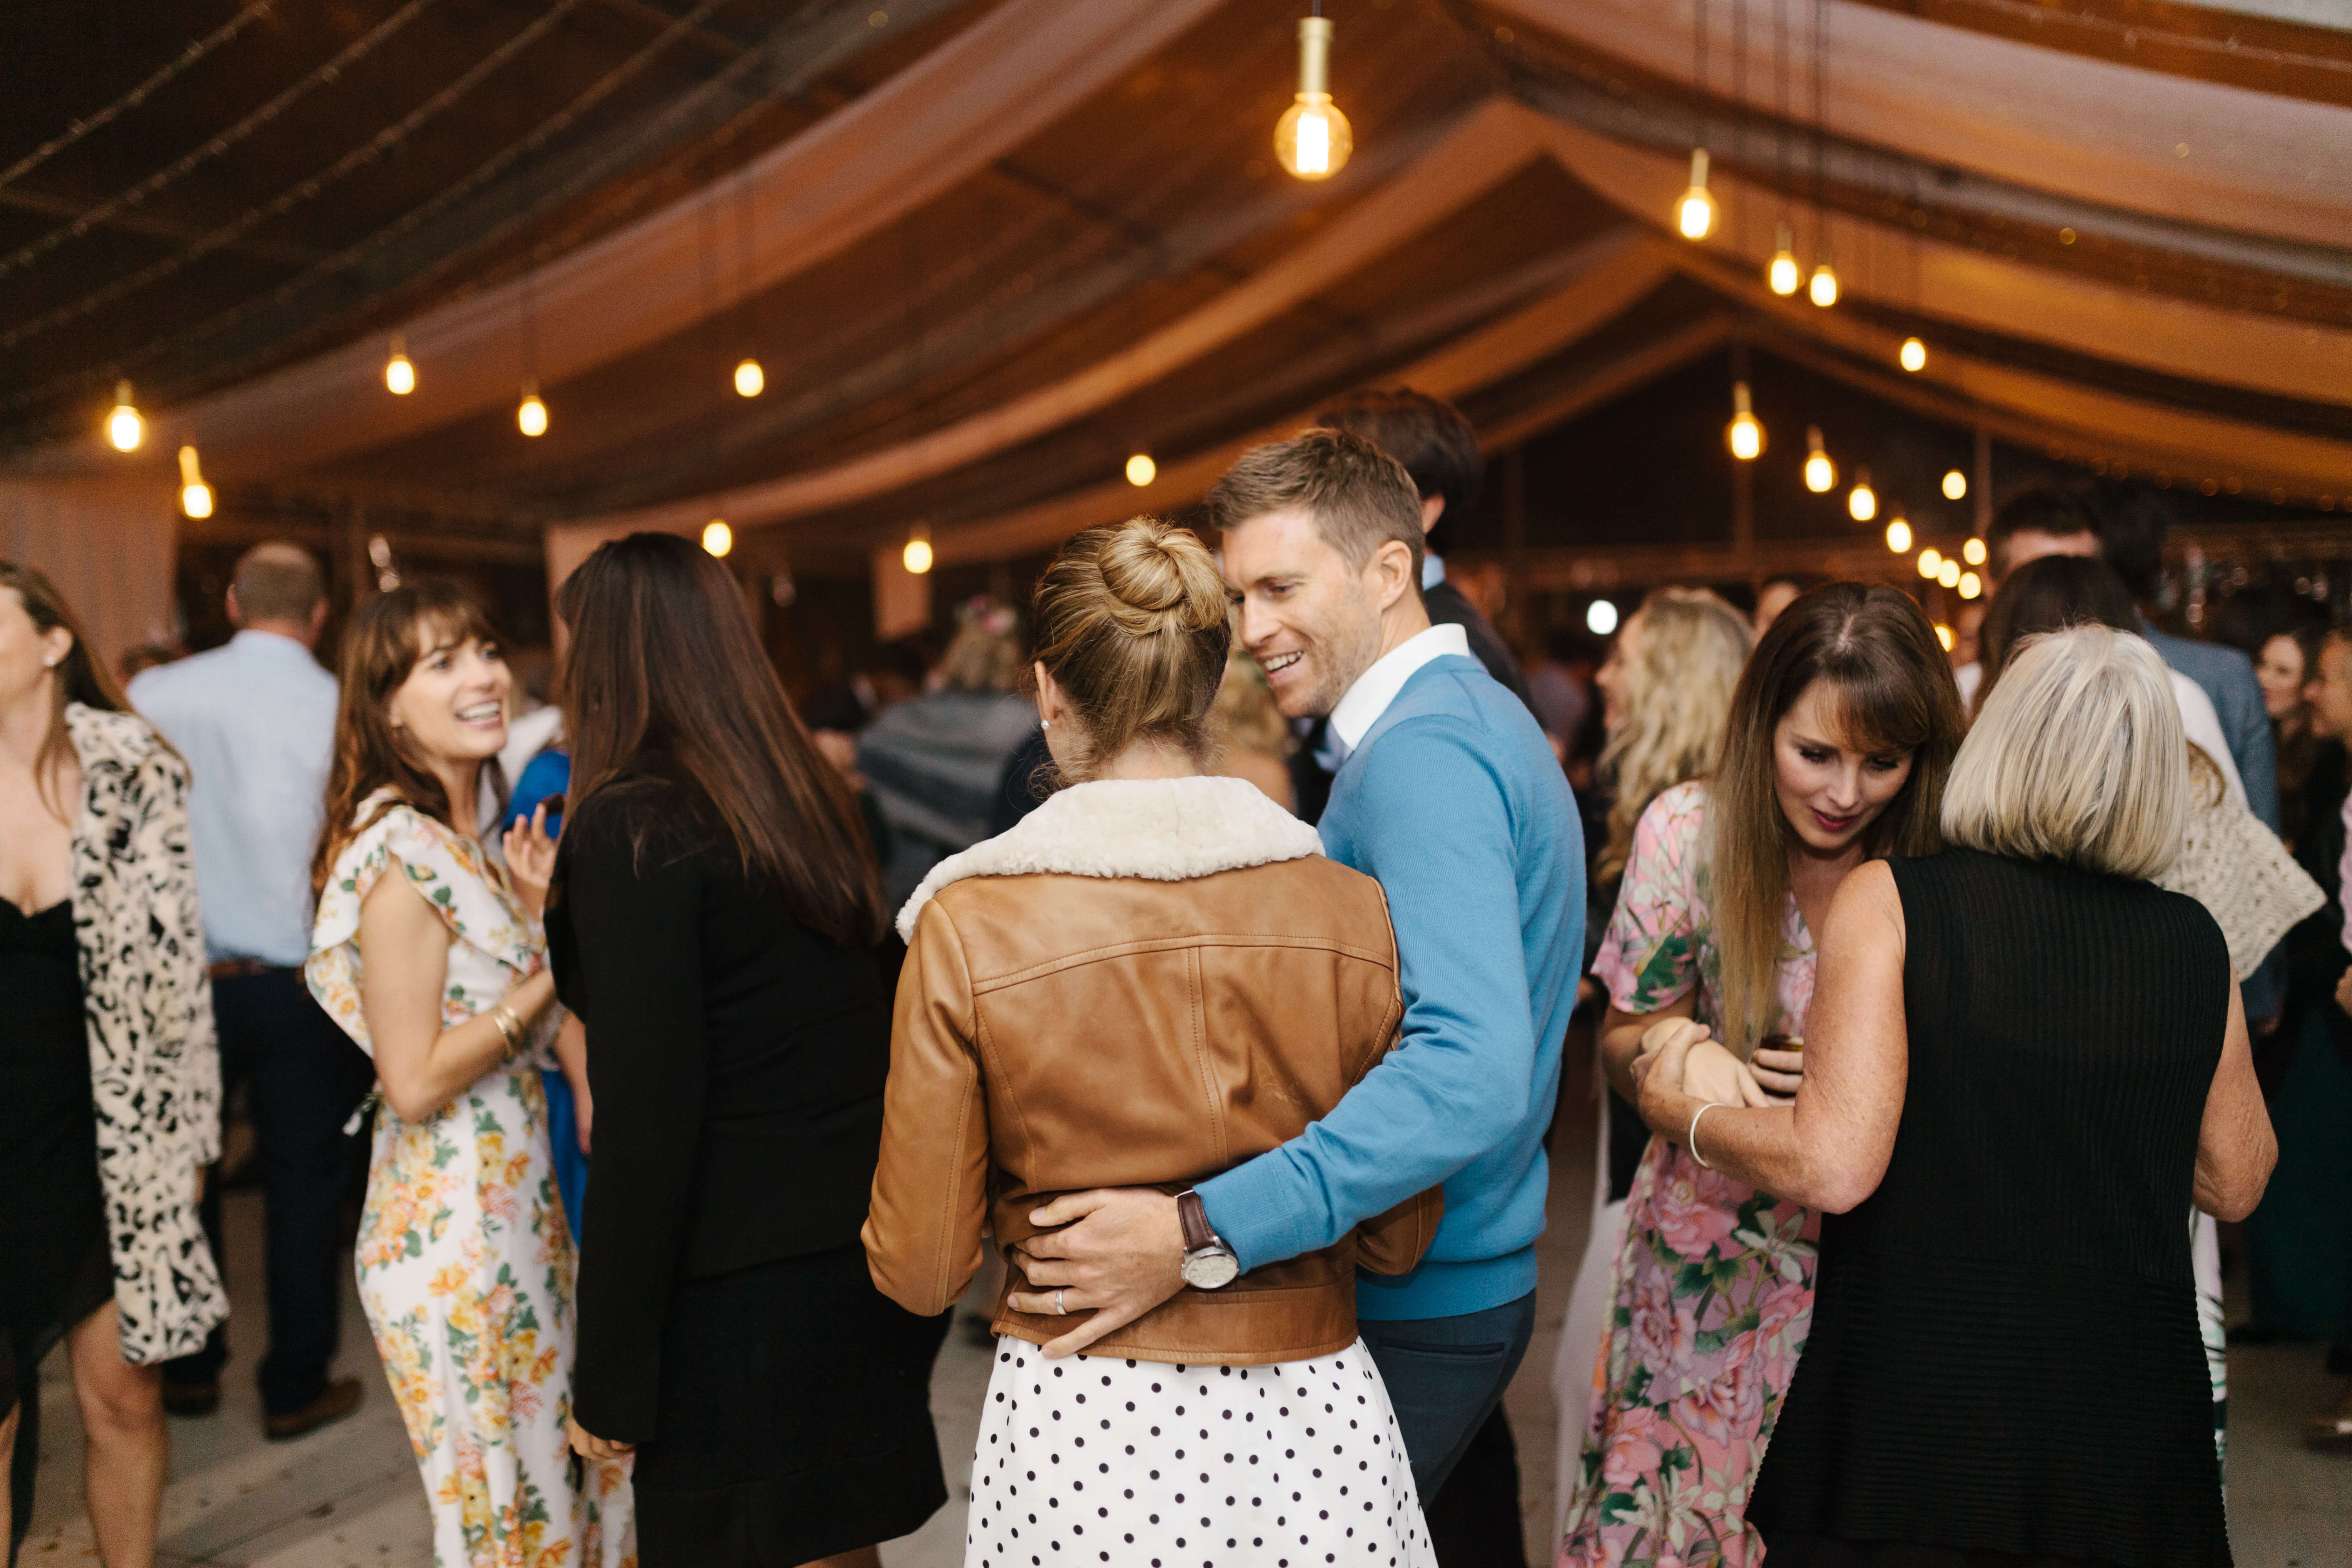 A couple embracing on a wedding dance floor.